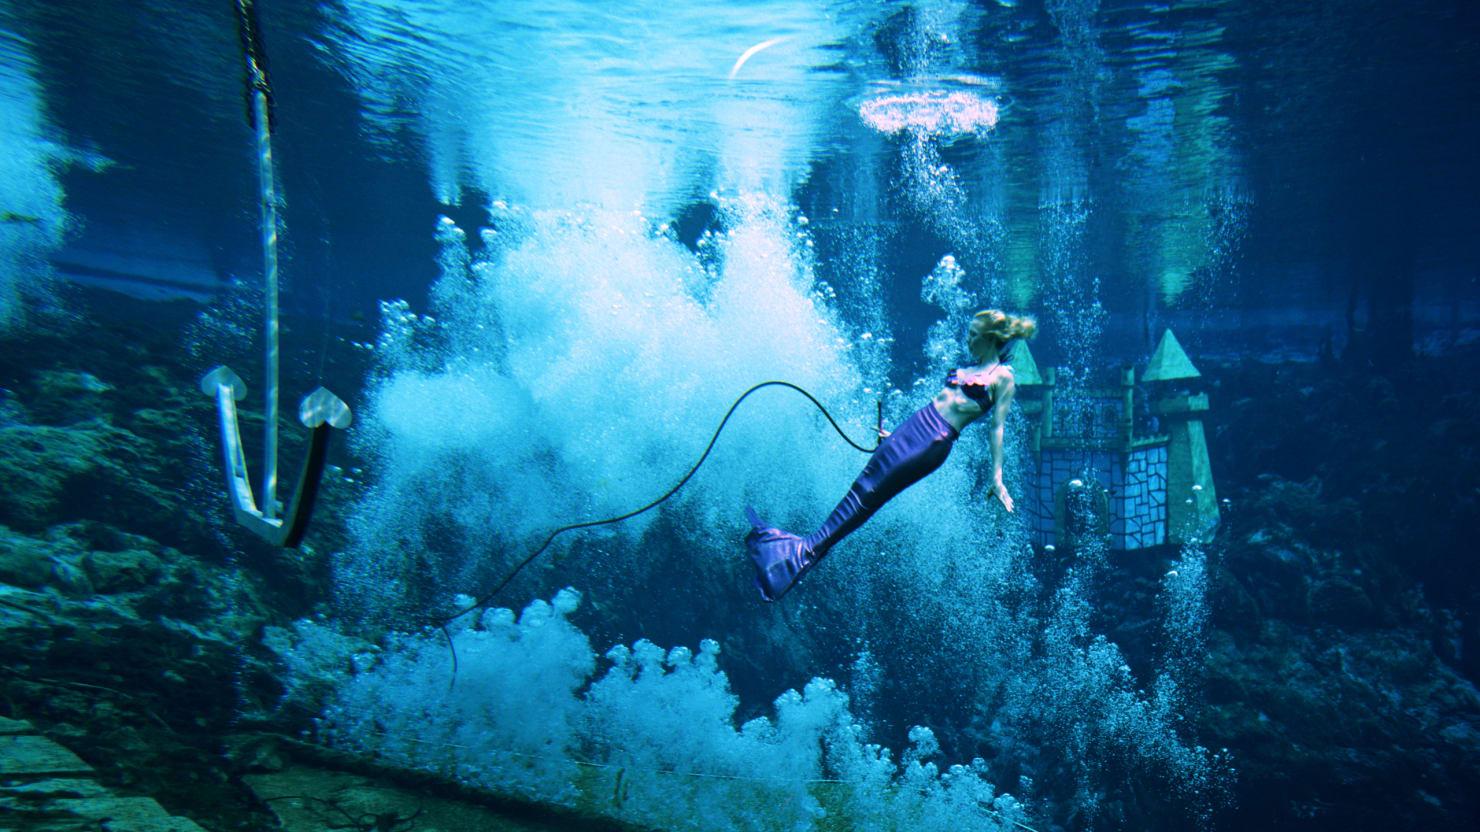 The world s craziest underwater adventures for Blue sea motor inn